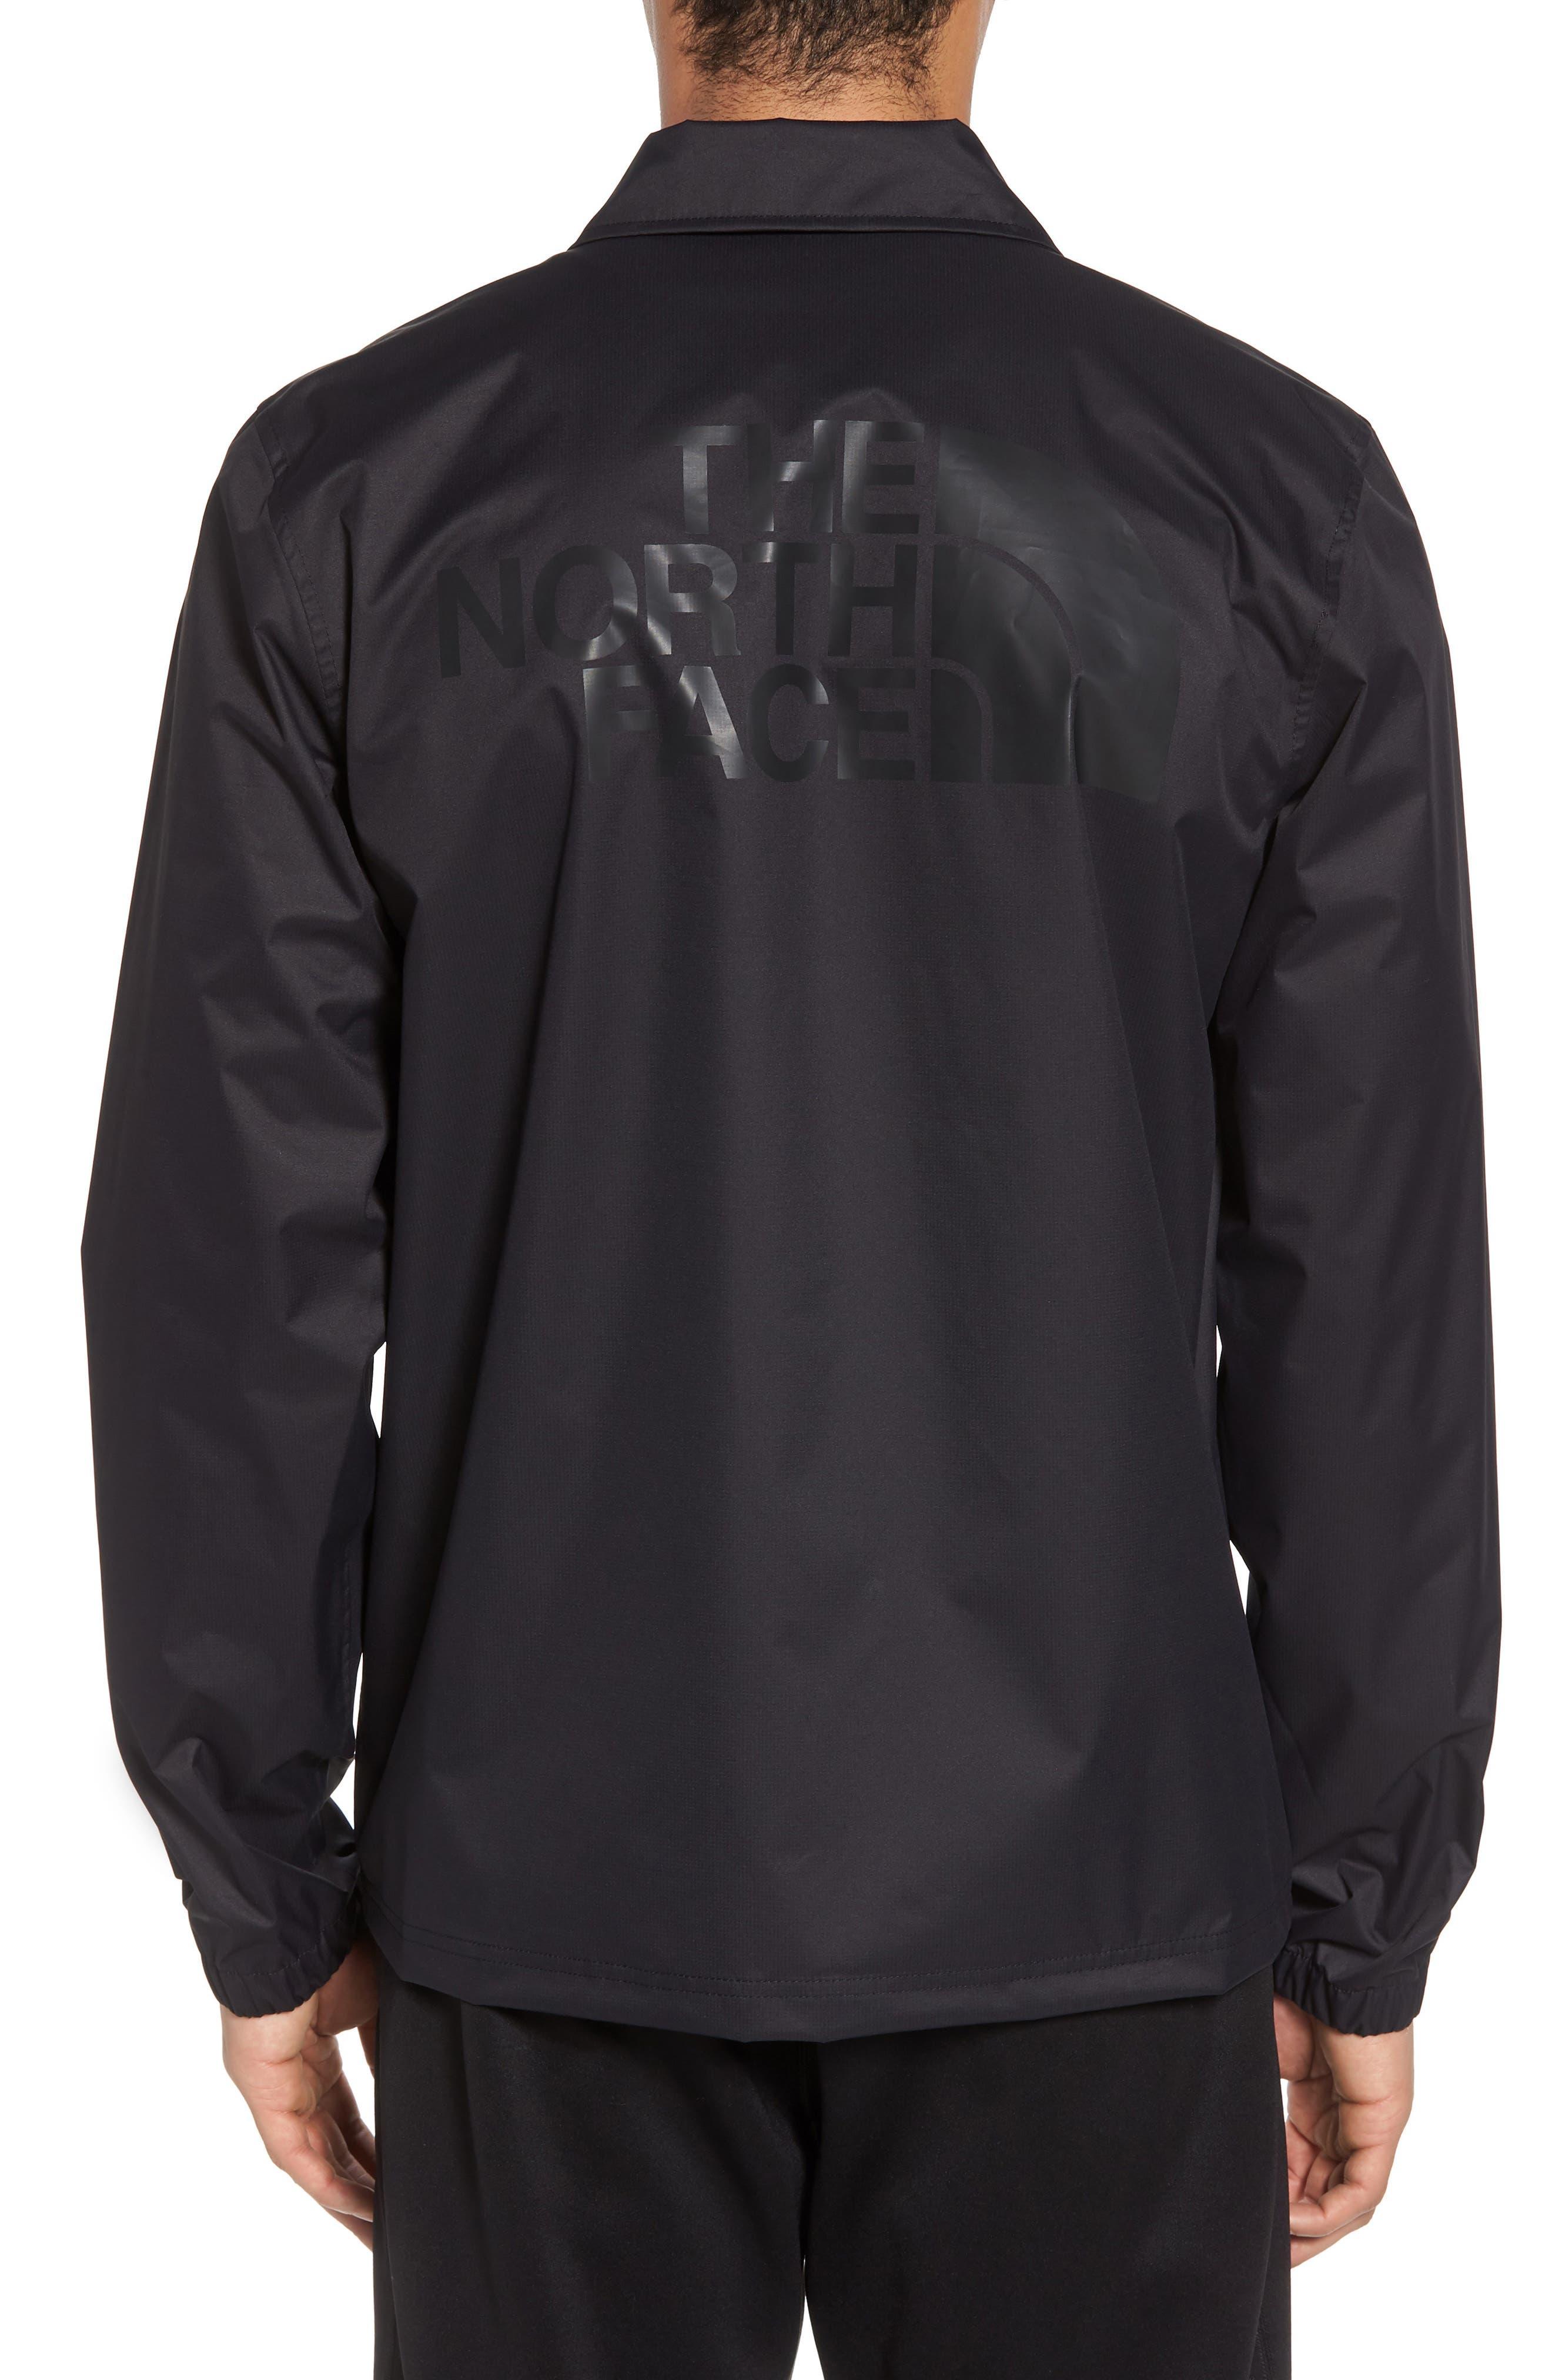 Coaches Rain Jacket,                             Alternate thumbnail 2, color,                             001